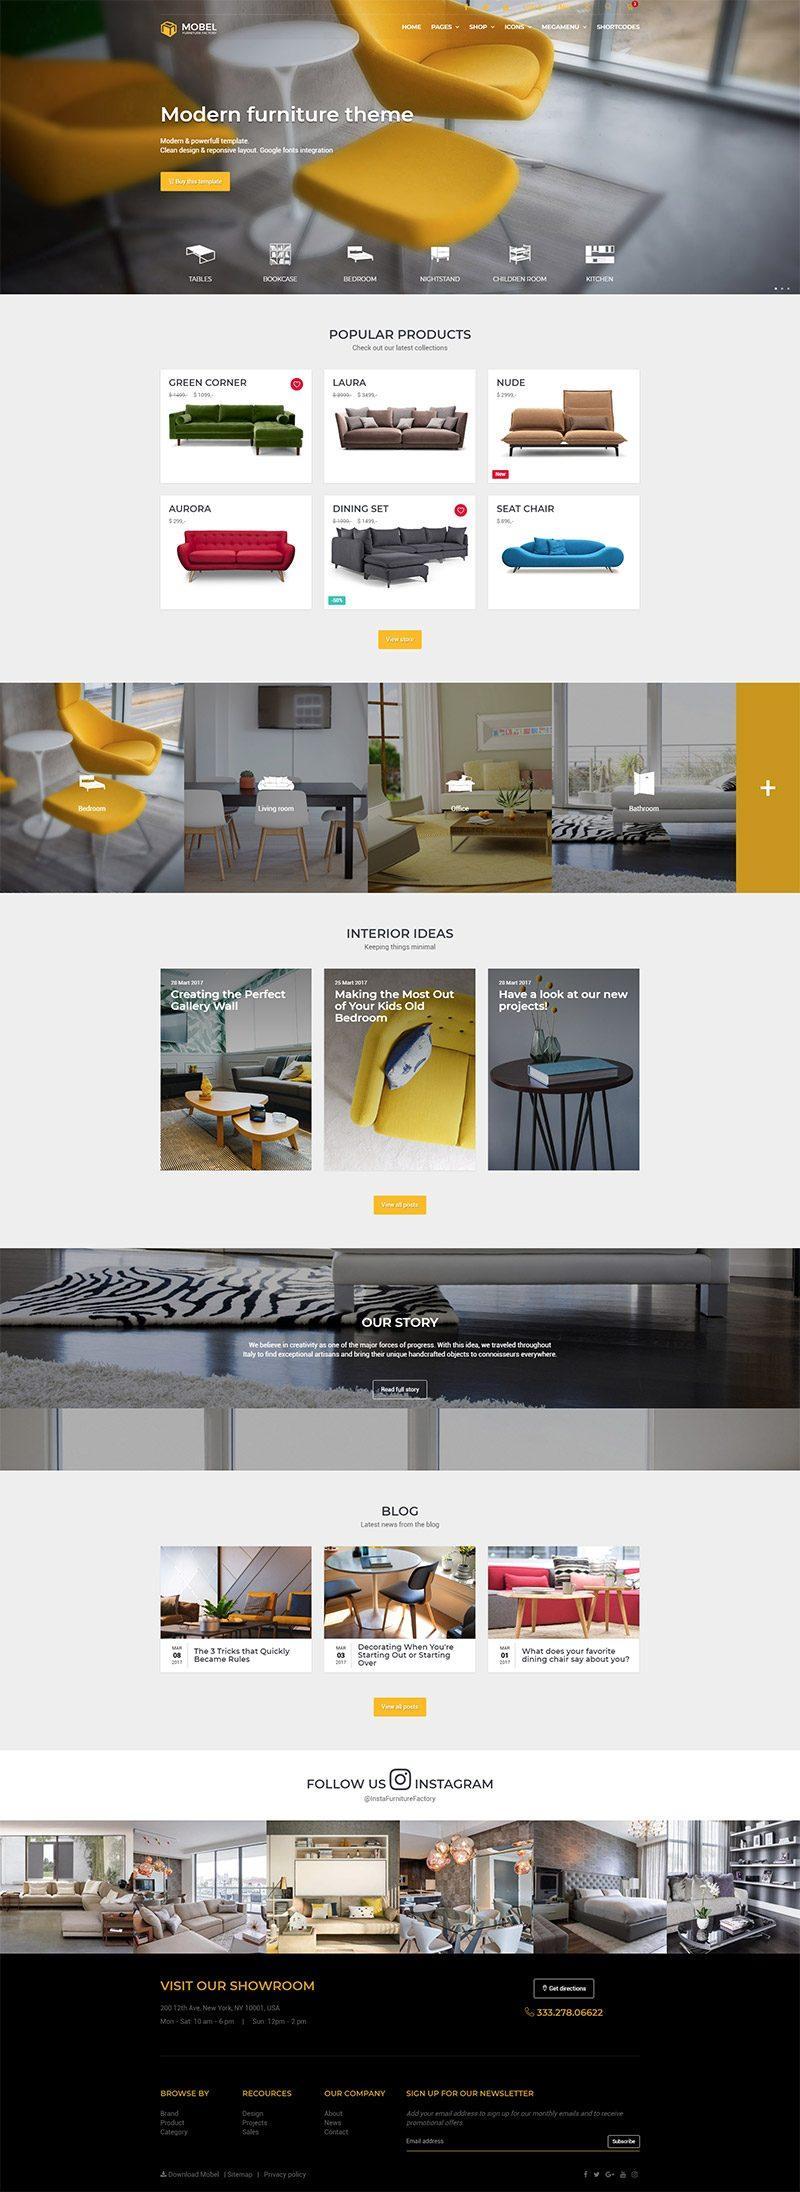 Giao-dien-website-thuong-mai-dien-tu-Mobel